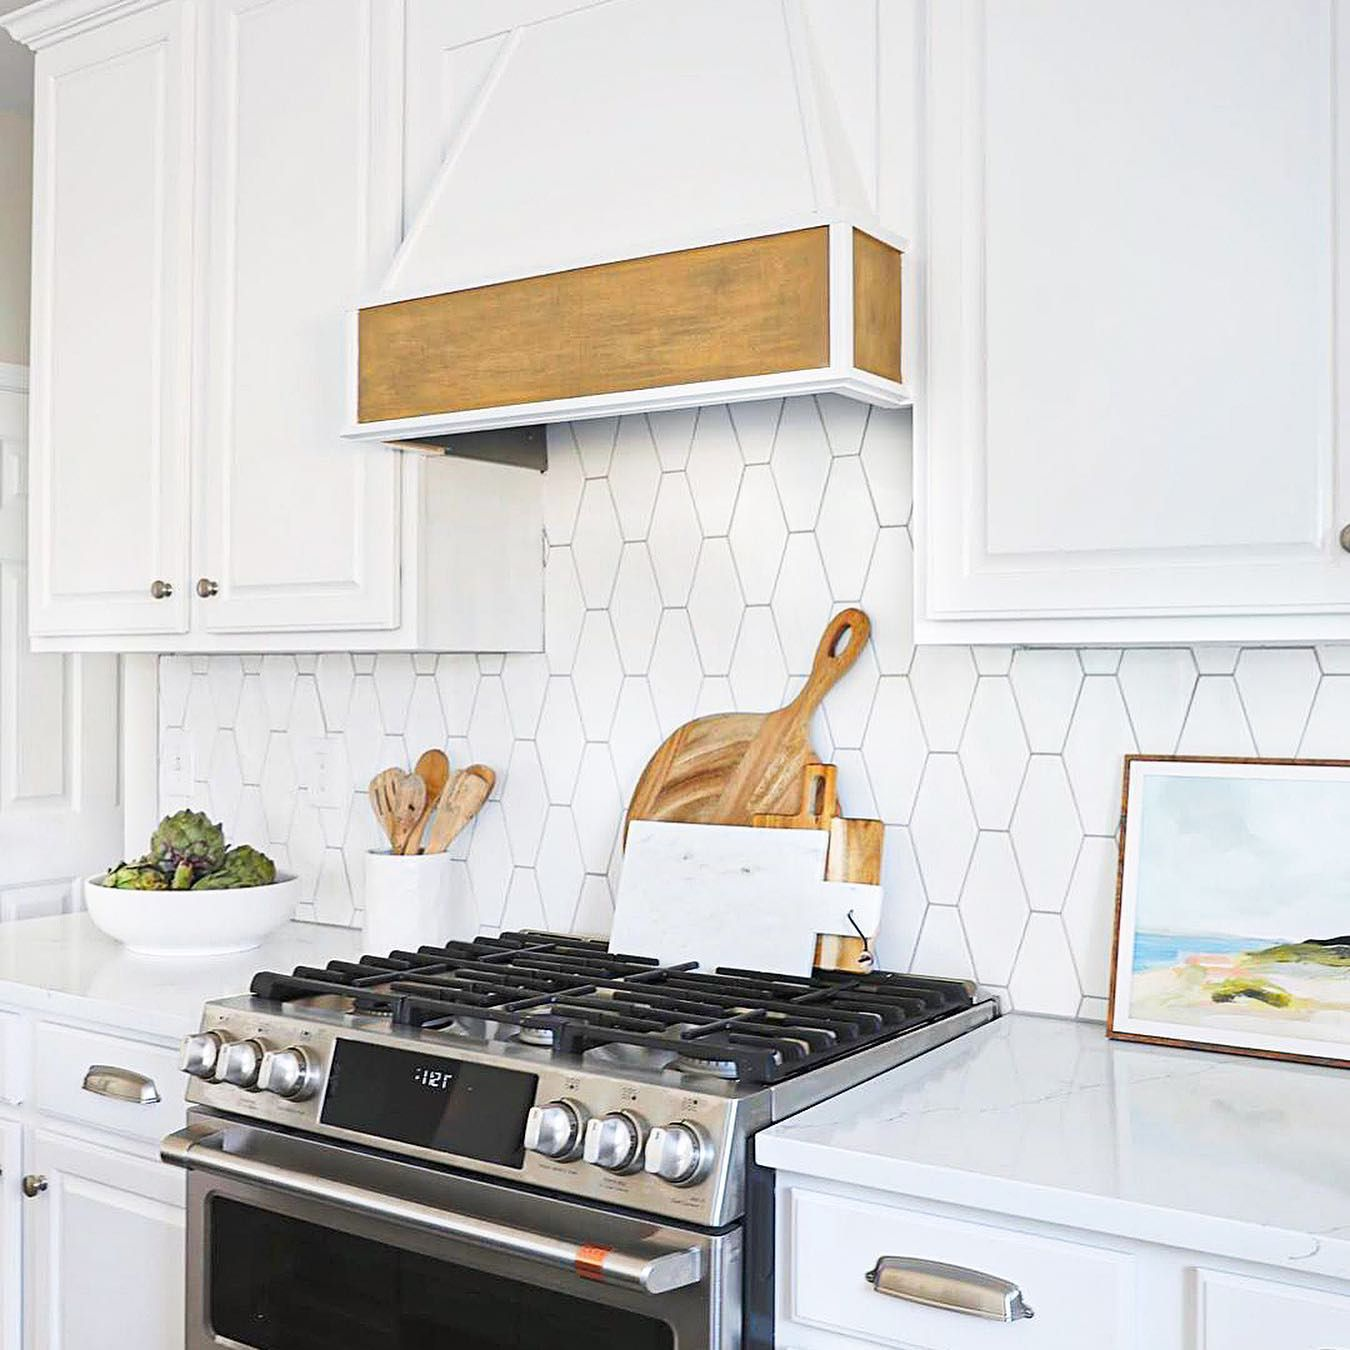 Manchester Hexagon Bianco 4x8 Ceramic Tile In 2020 Kitchen Tiles Backsplash Kitchen Tiles Ceramic Tiles